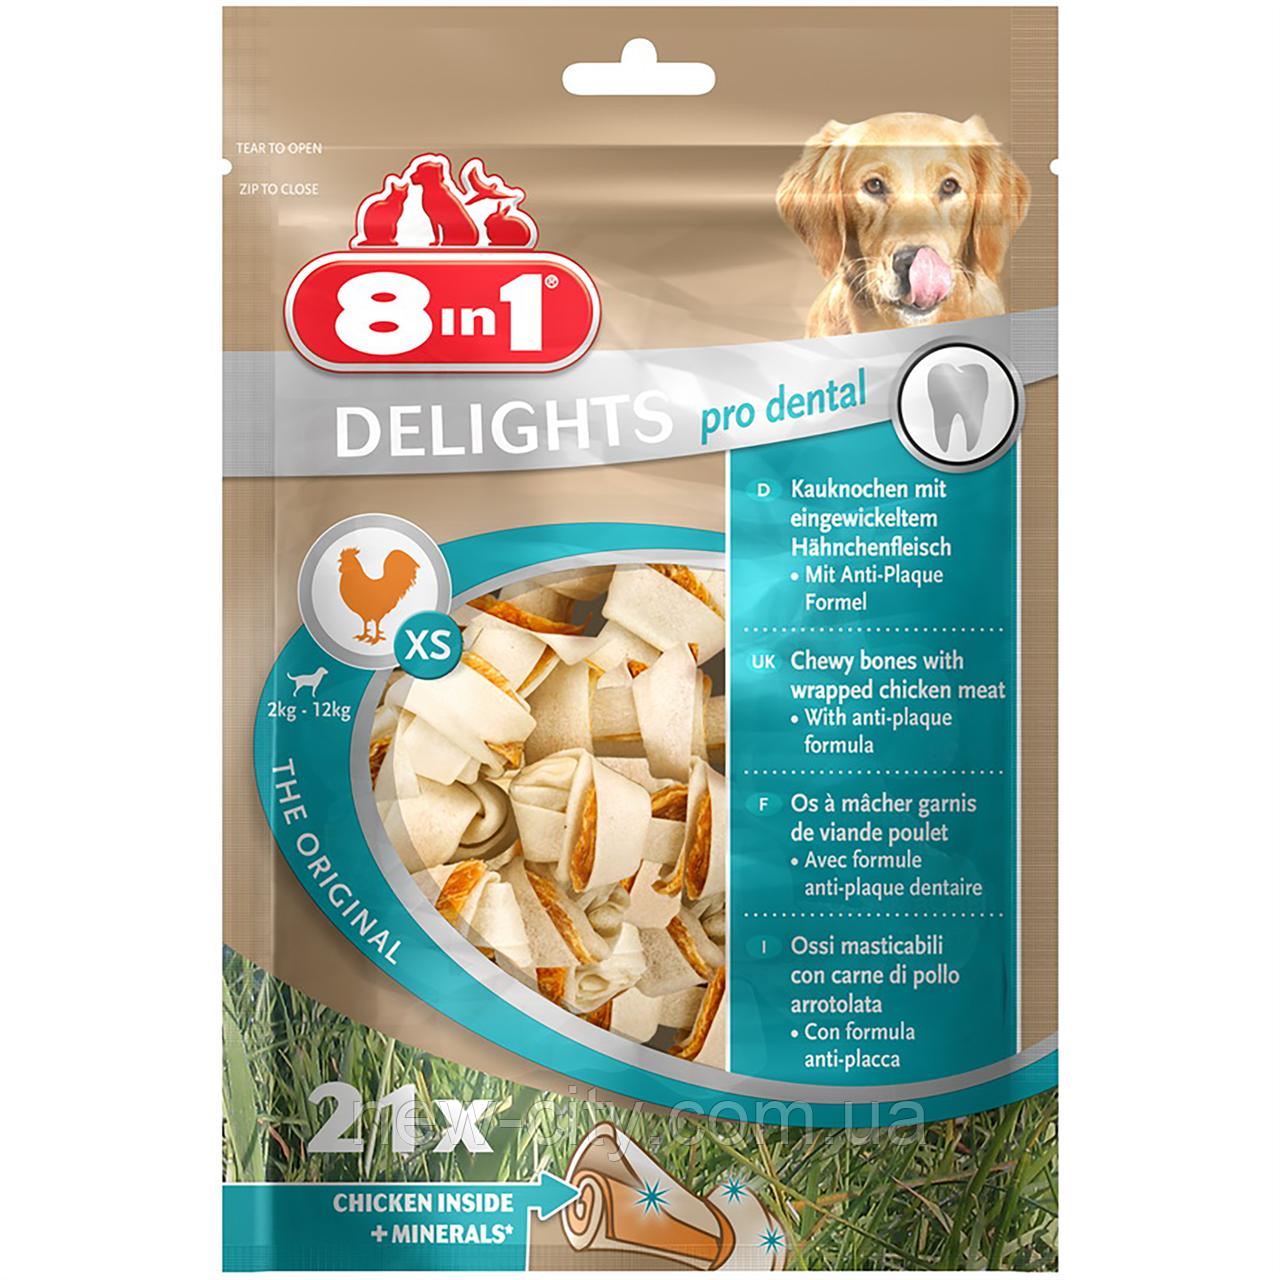 8in1 Delights Pro Dental Лакомство для собак — кости для чистки зубов с мясом (21шт) XS